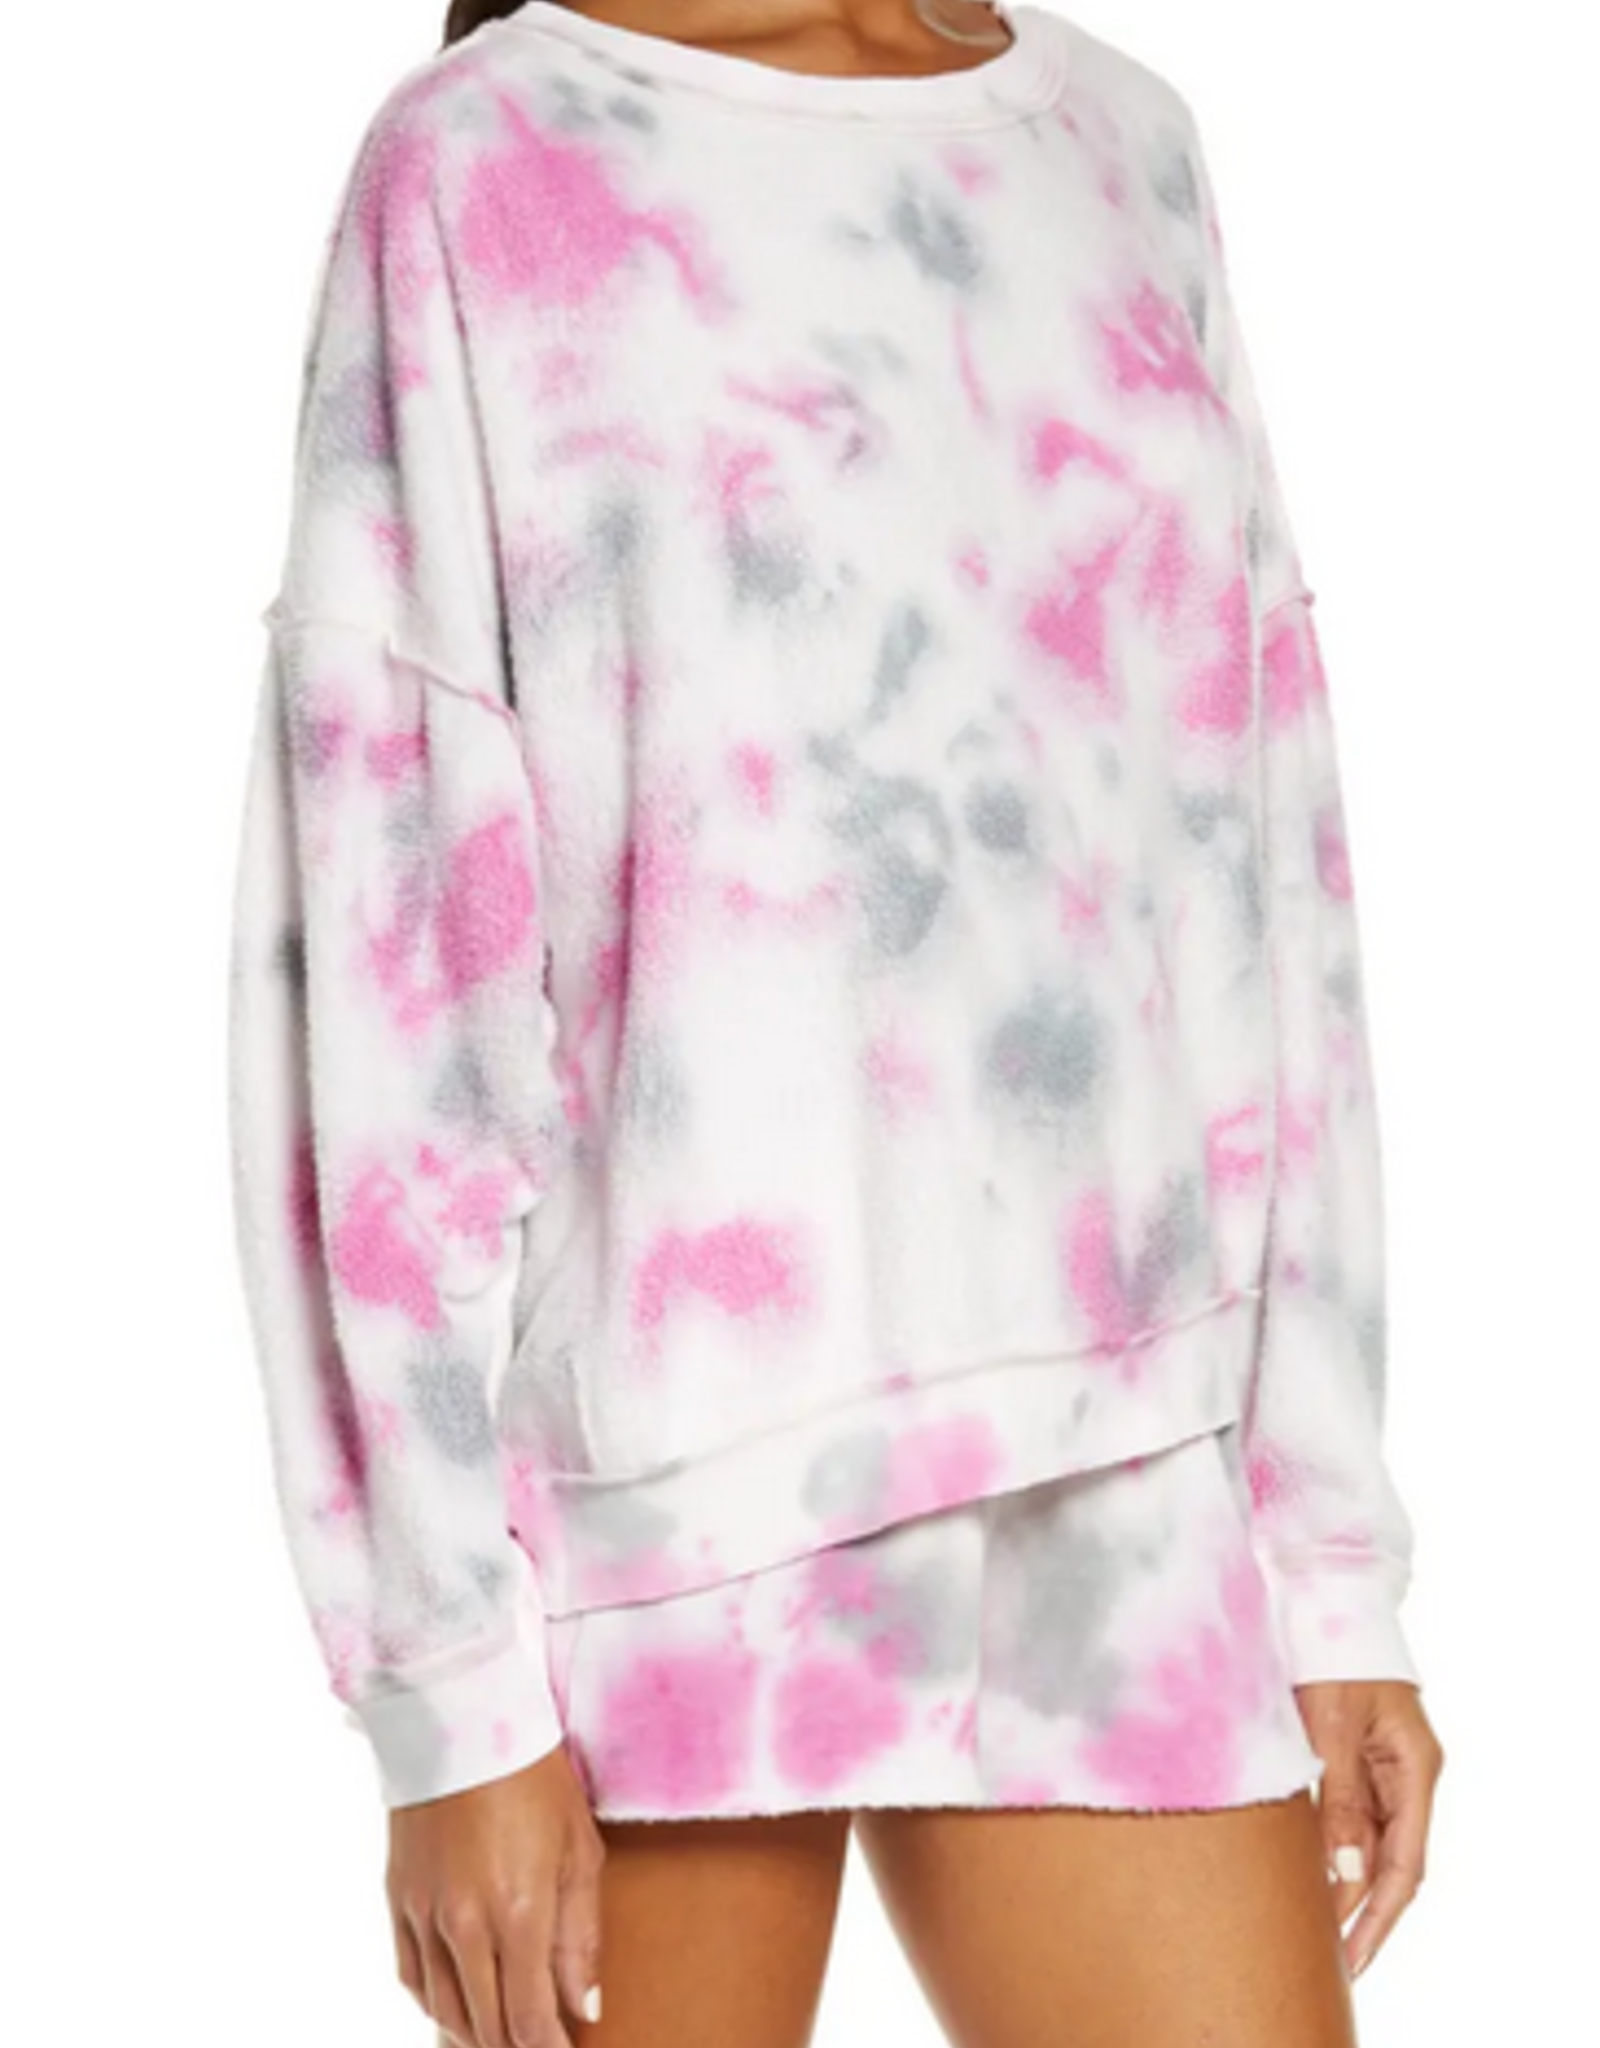 Free People Kelly Washed Tie Dye Sweatshirt and short set